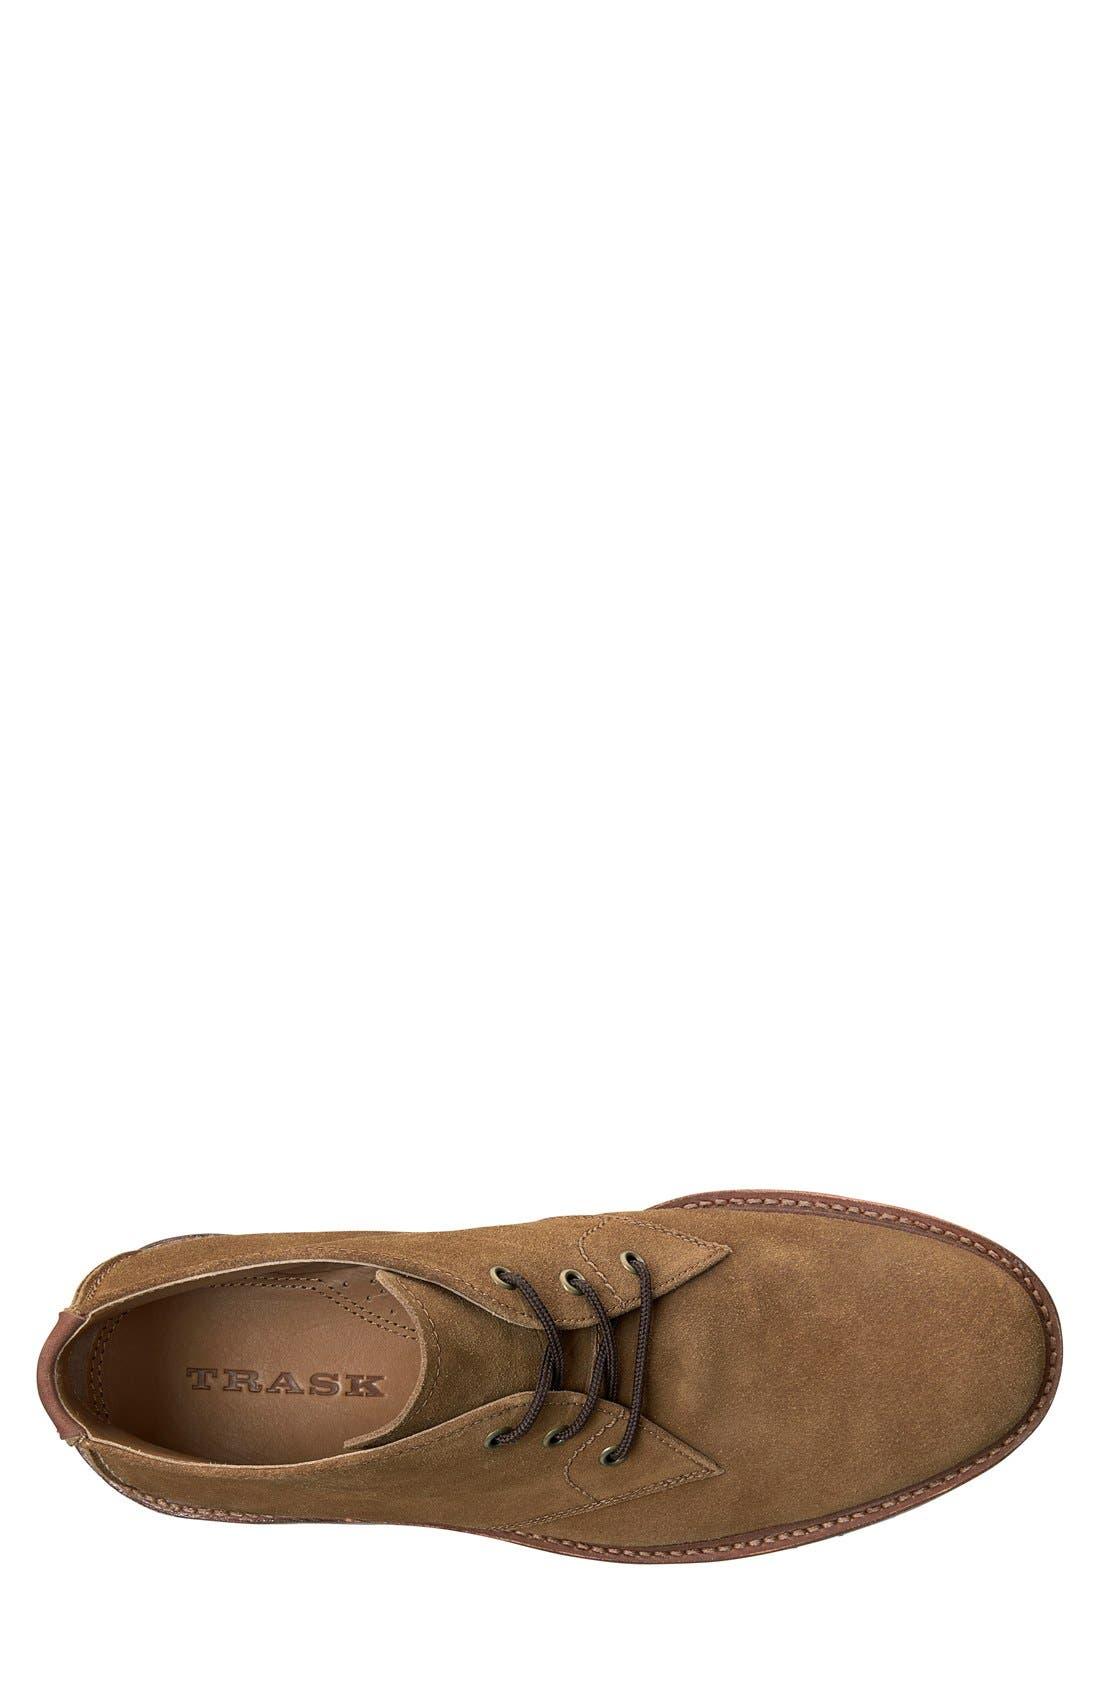 'Gulch II' Chukka Boot,                             Alternate thumbnail 3, color,                             024